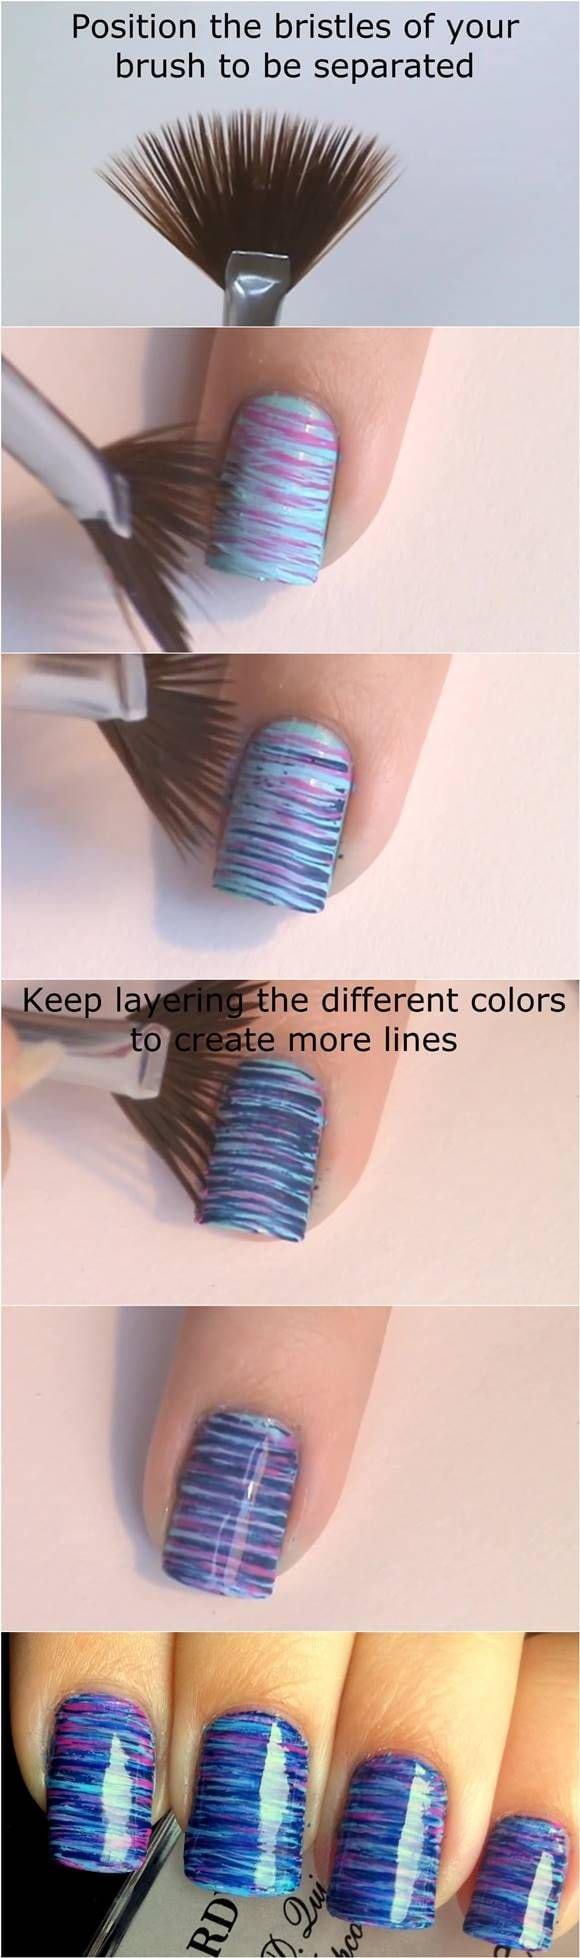 How to DIY Blue and Pink Fan Brush Striped Nail Art #fashion #beauty #nail_art Source by miranda1968   …